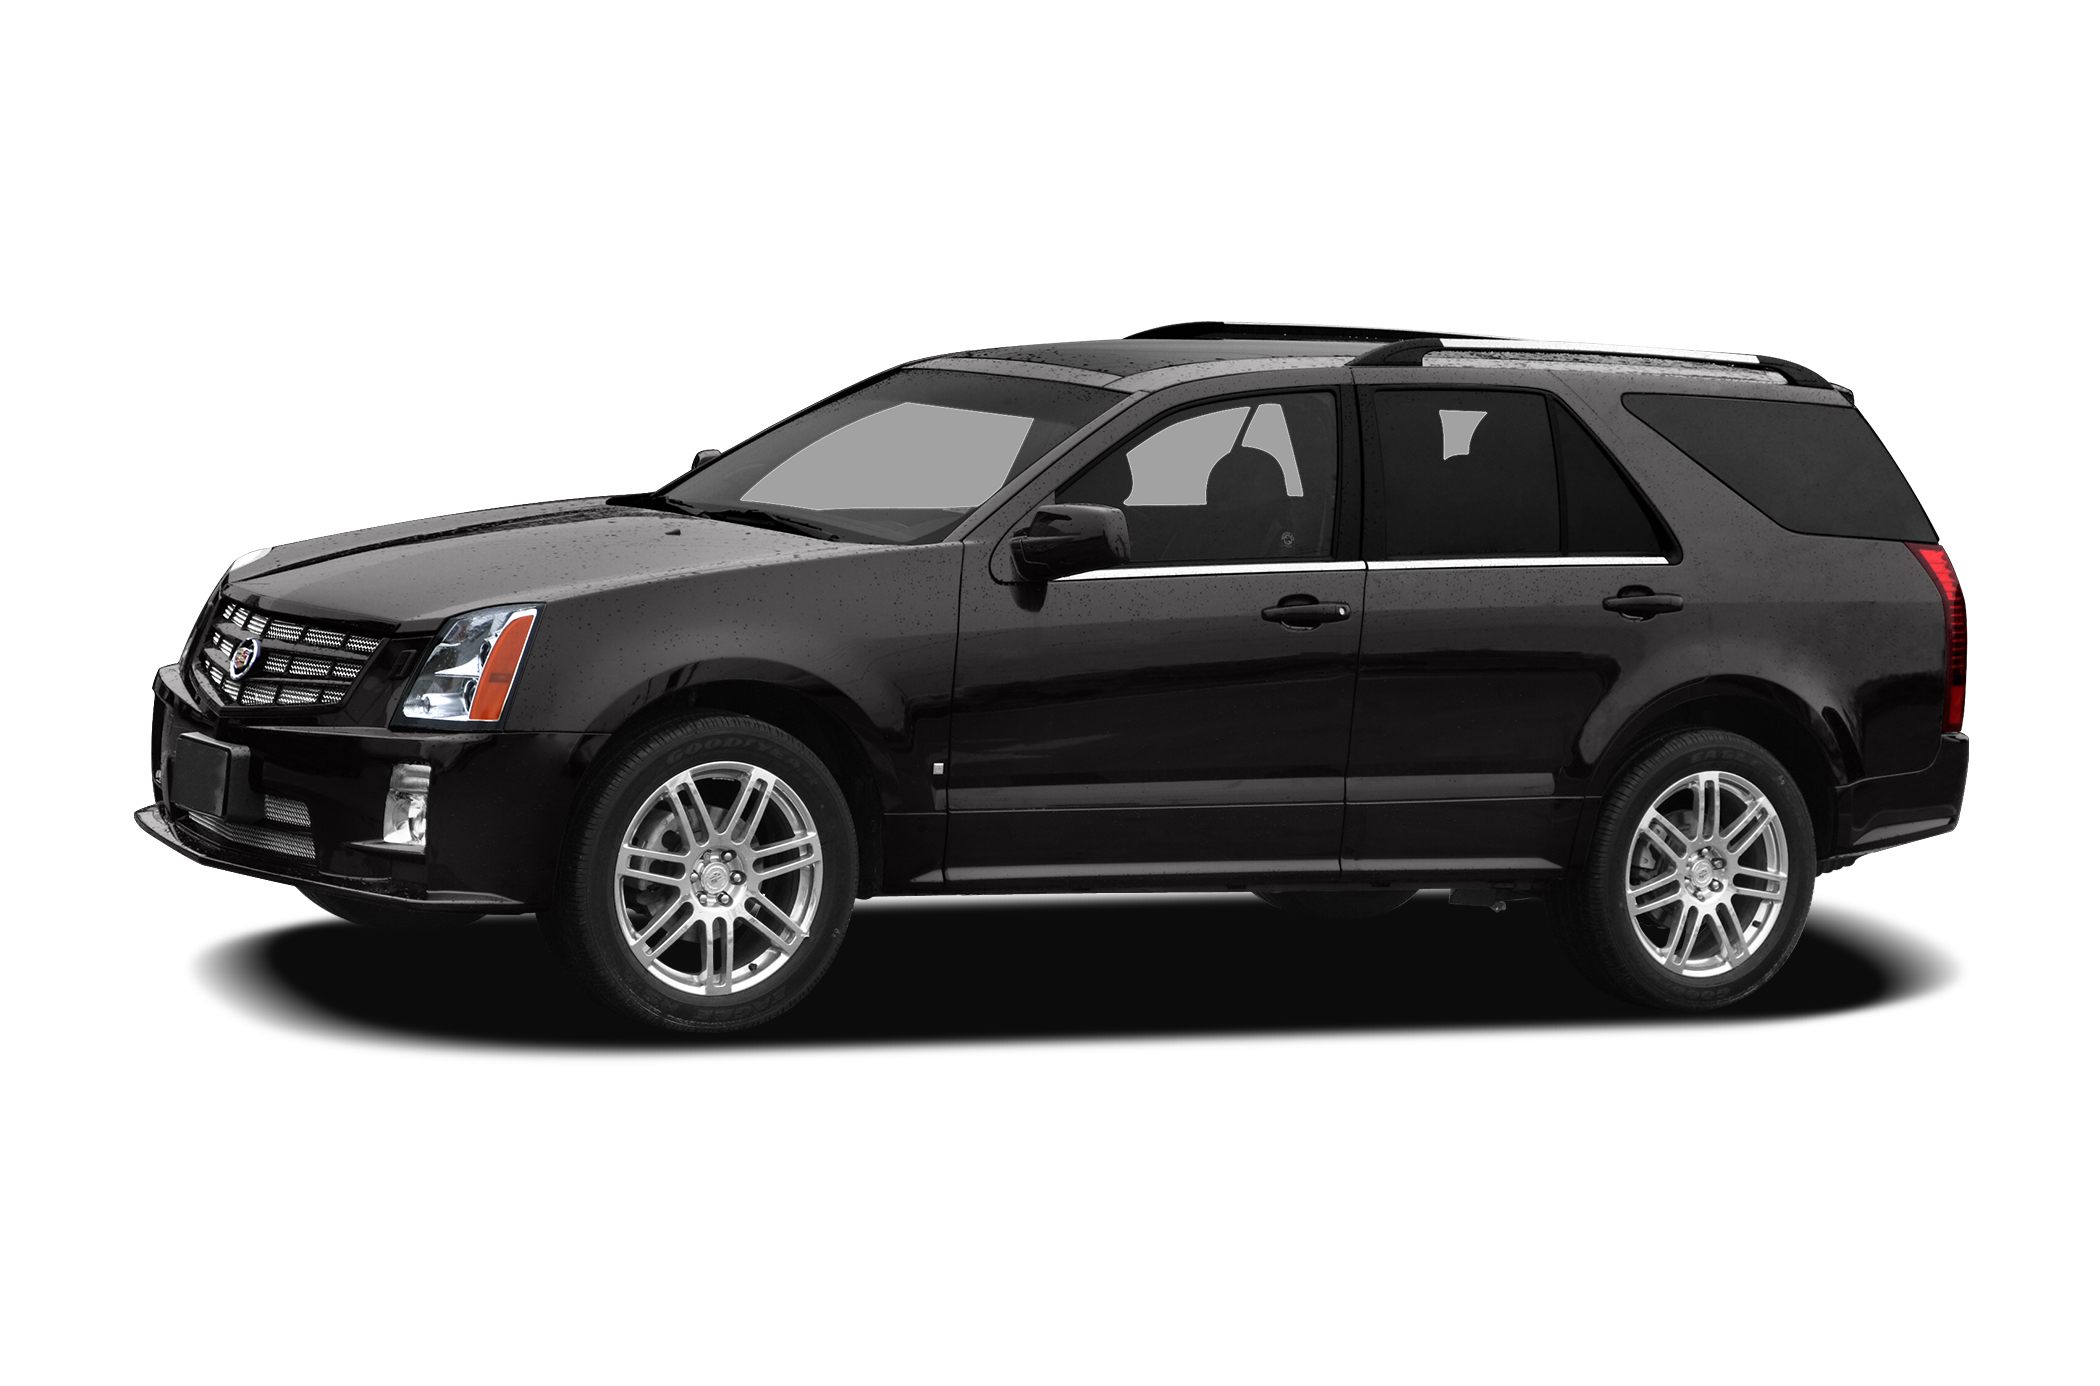 2008 Cadillac SRX New Car Test Drive